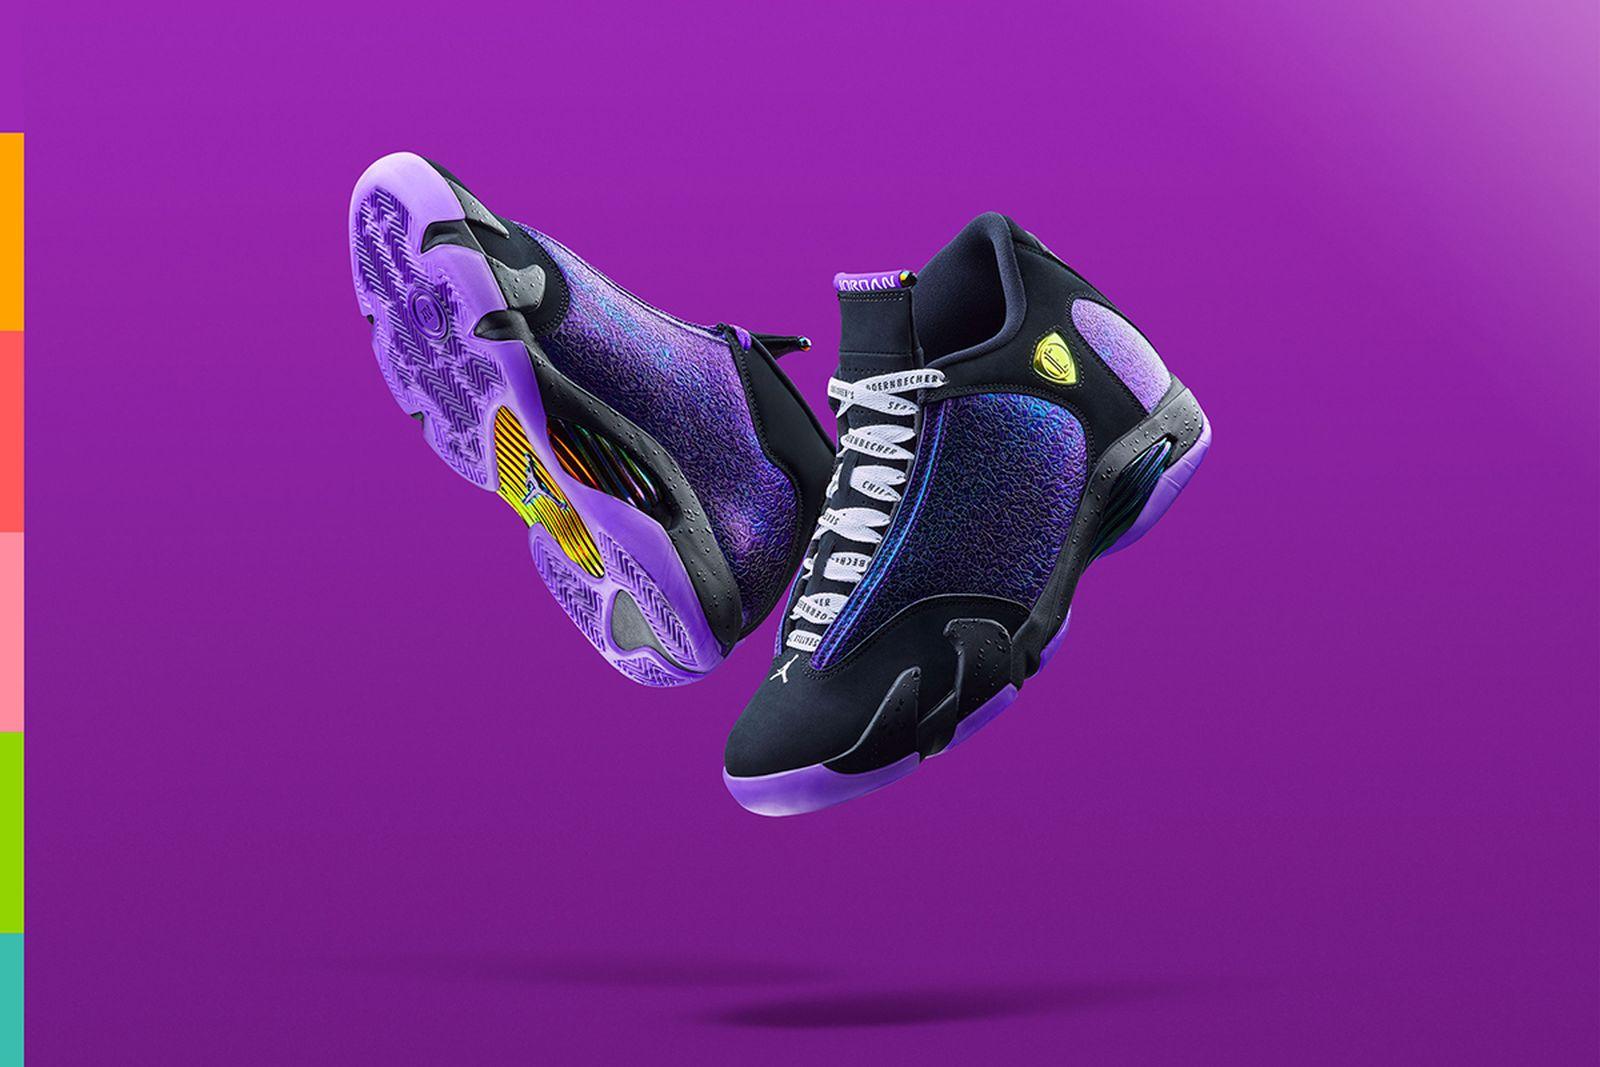 Nike Doernbecher Freestyle 2019 Air Jordan 14